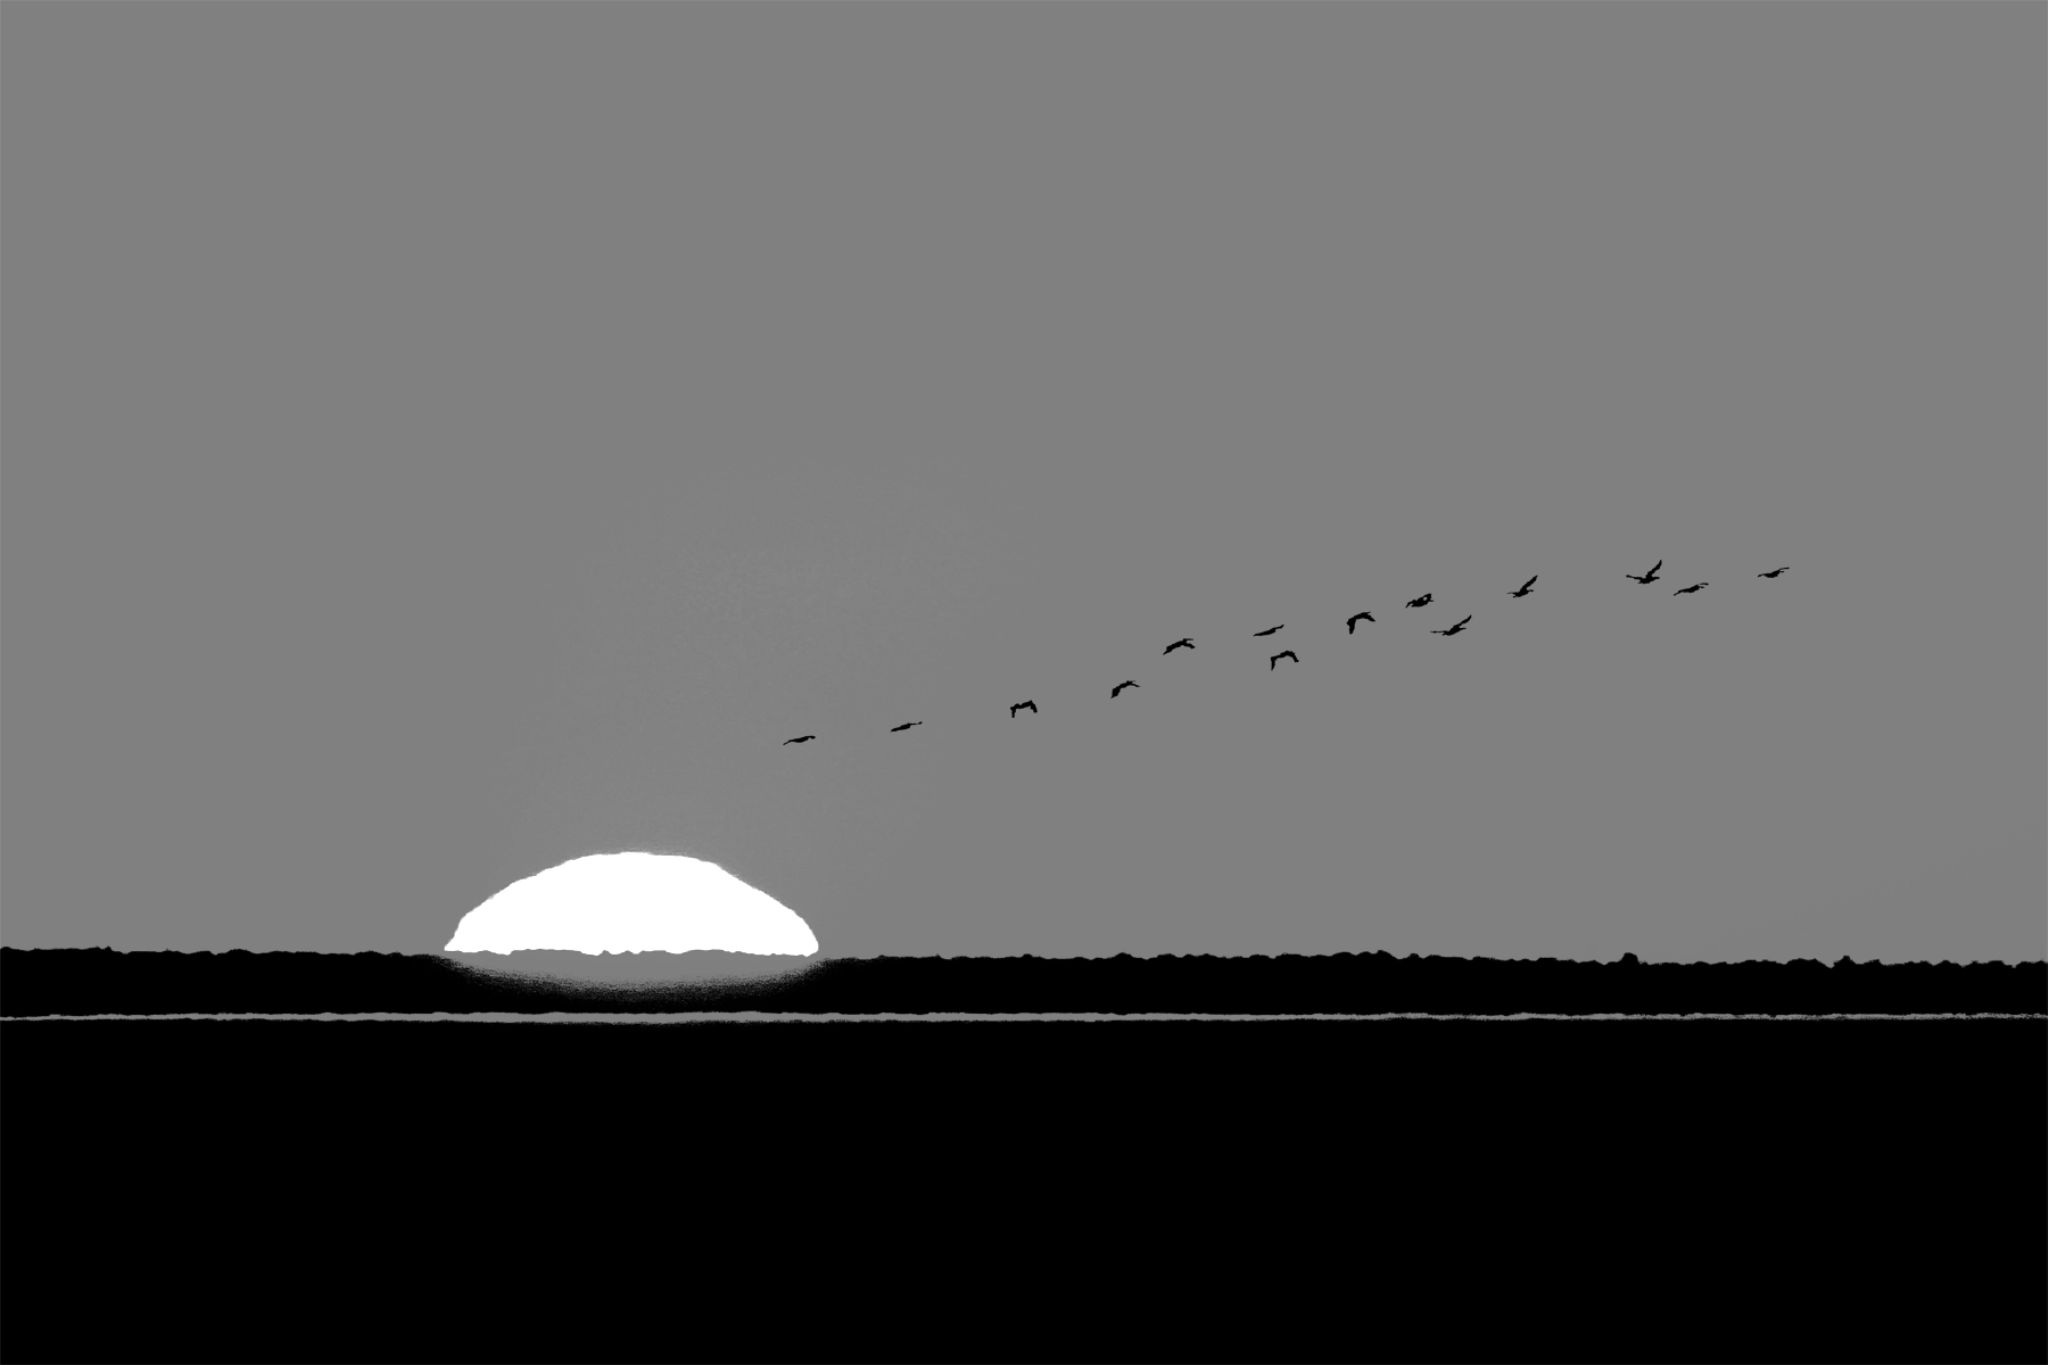 Göçmen Kuşlar ( Migratory Birds ) by Suleyman Bilgen